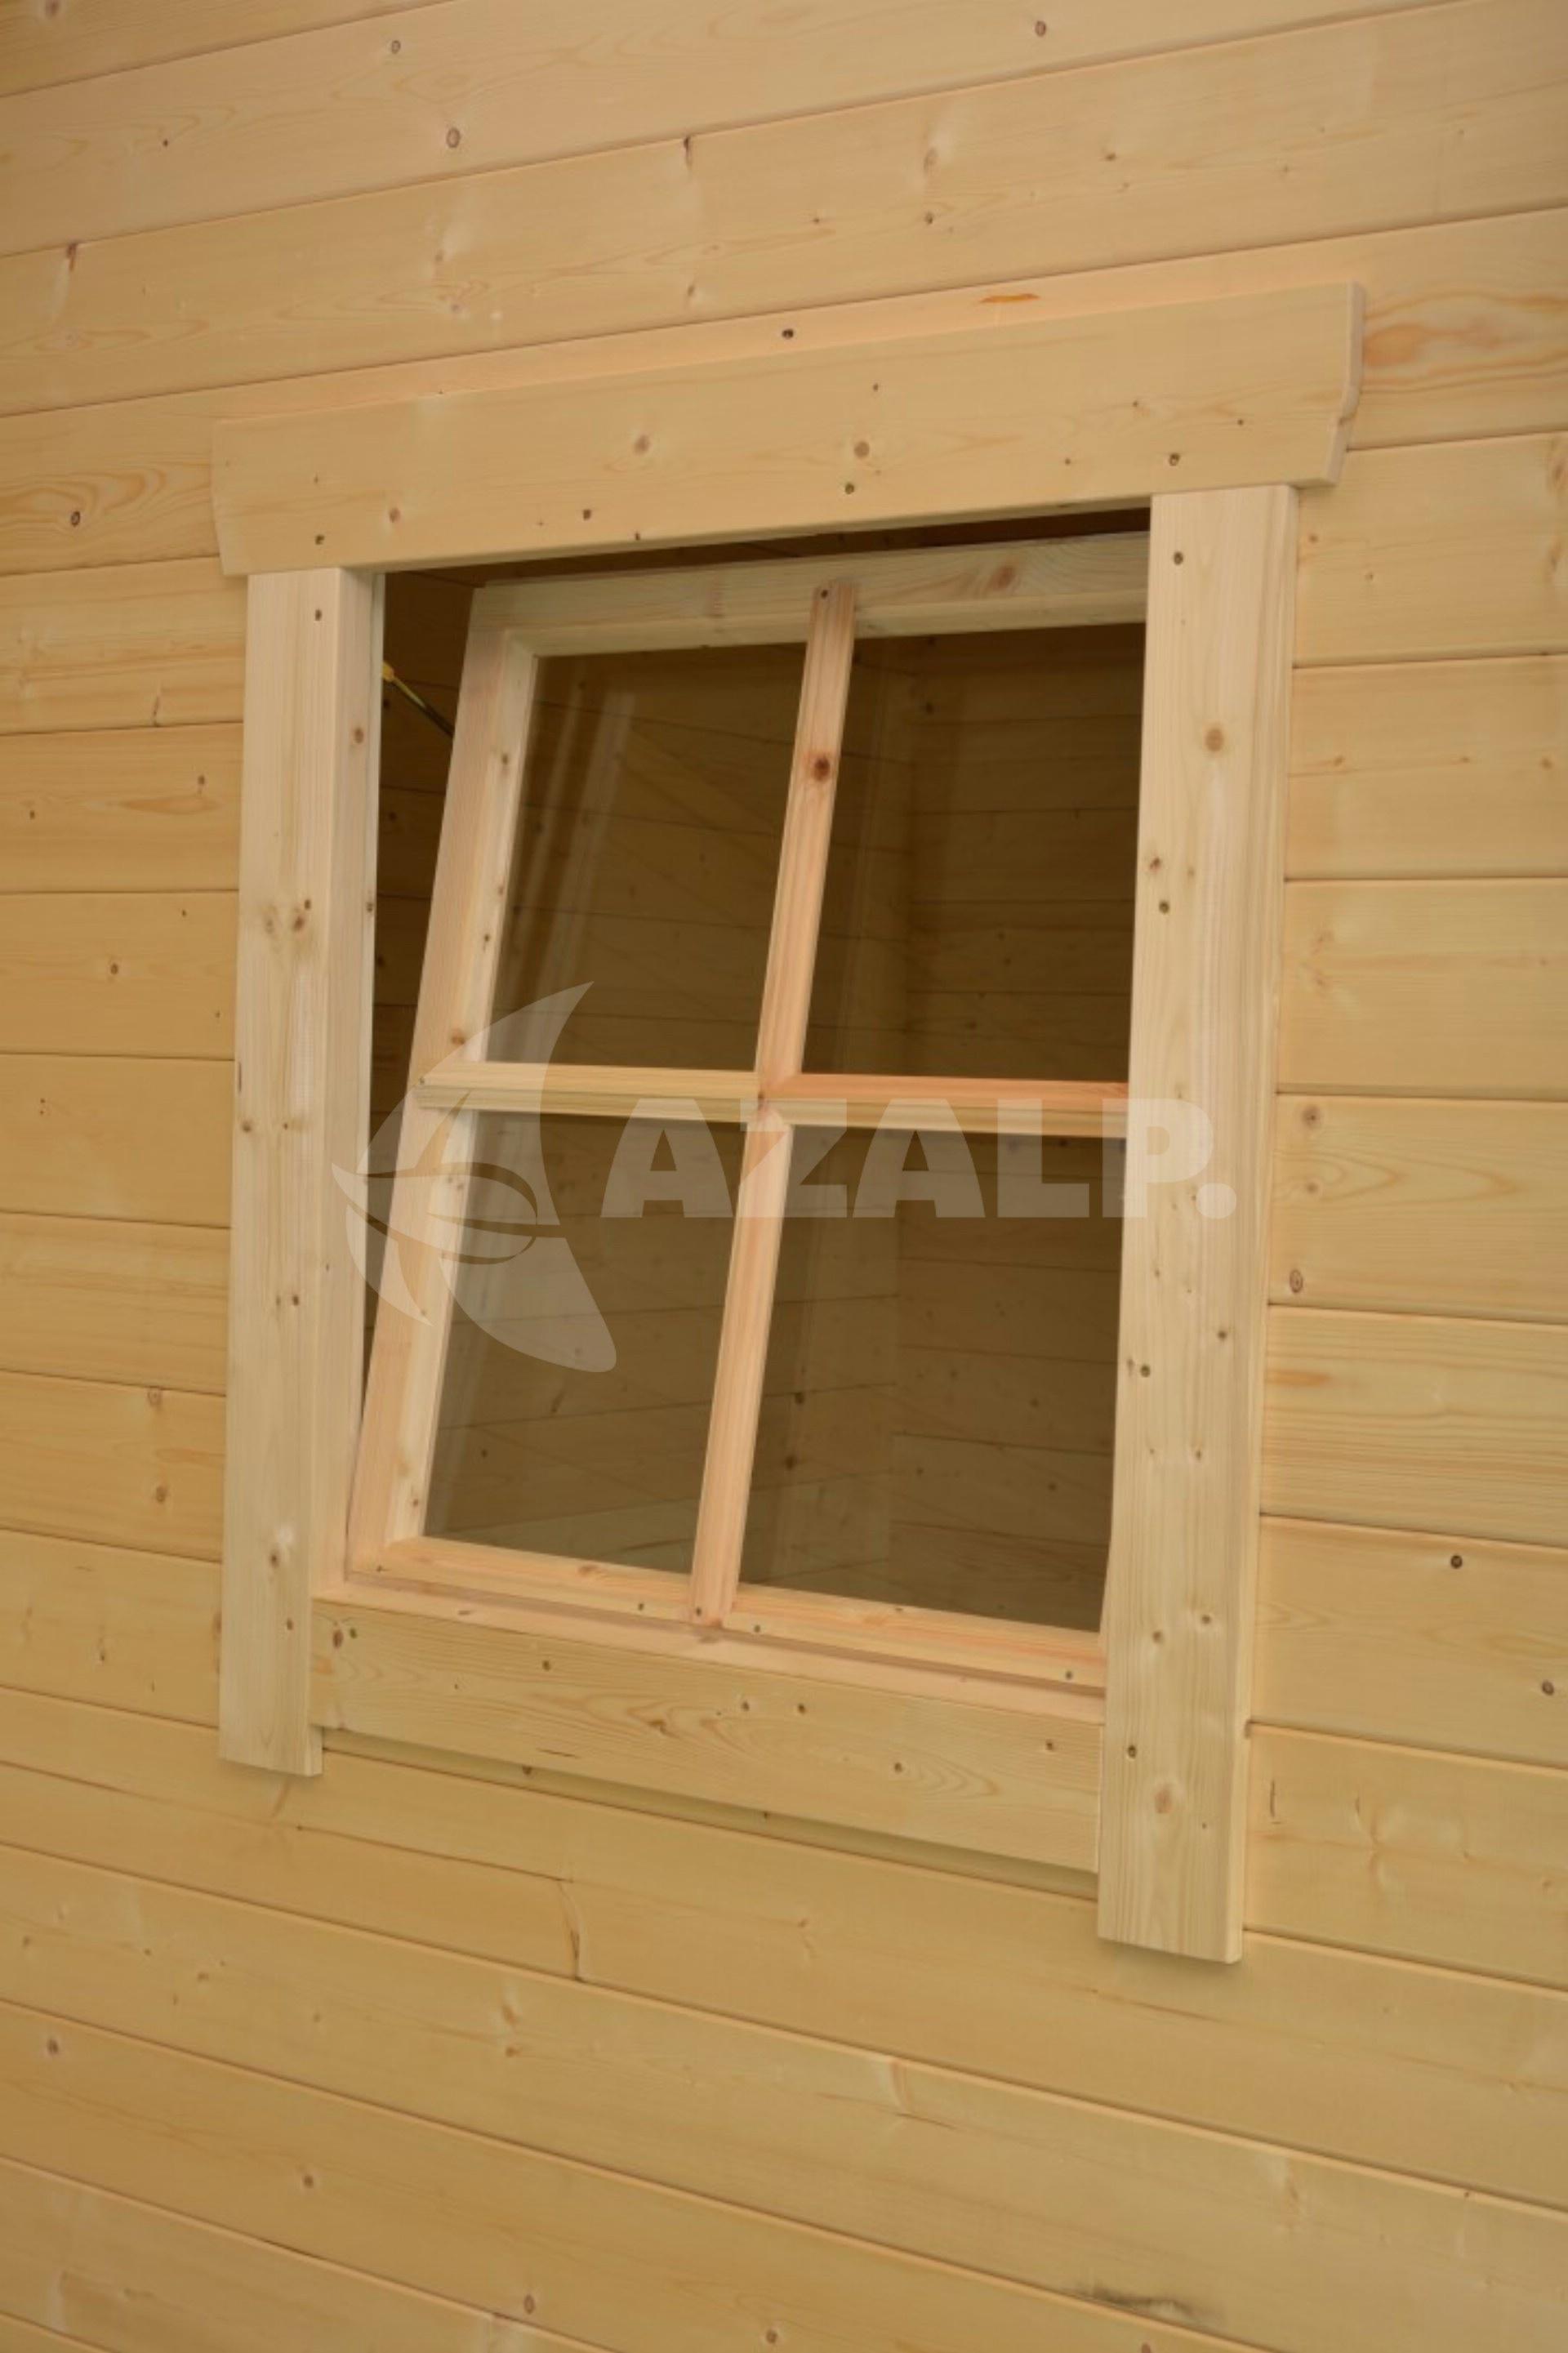 azalp dreh kippfenster 80x88 cm kaufen bei. Black Bedroom Furniture Sets. Home Design Ideas